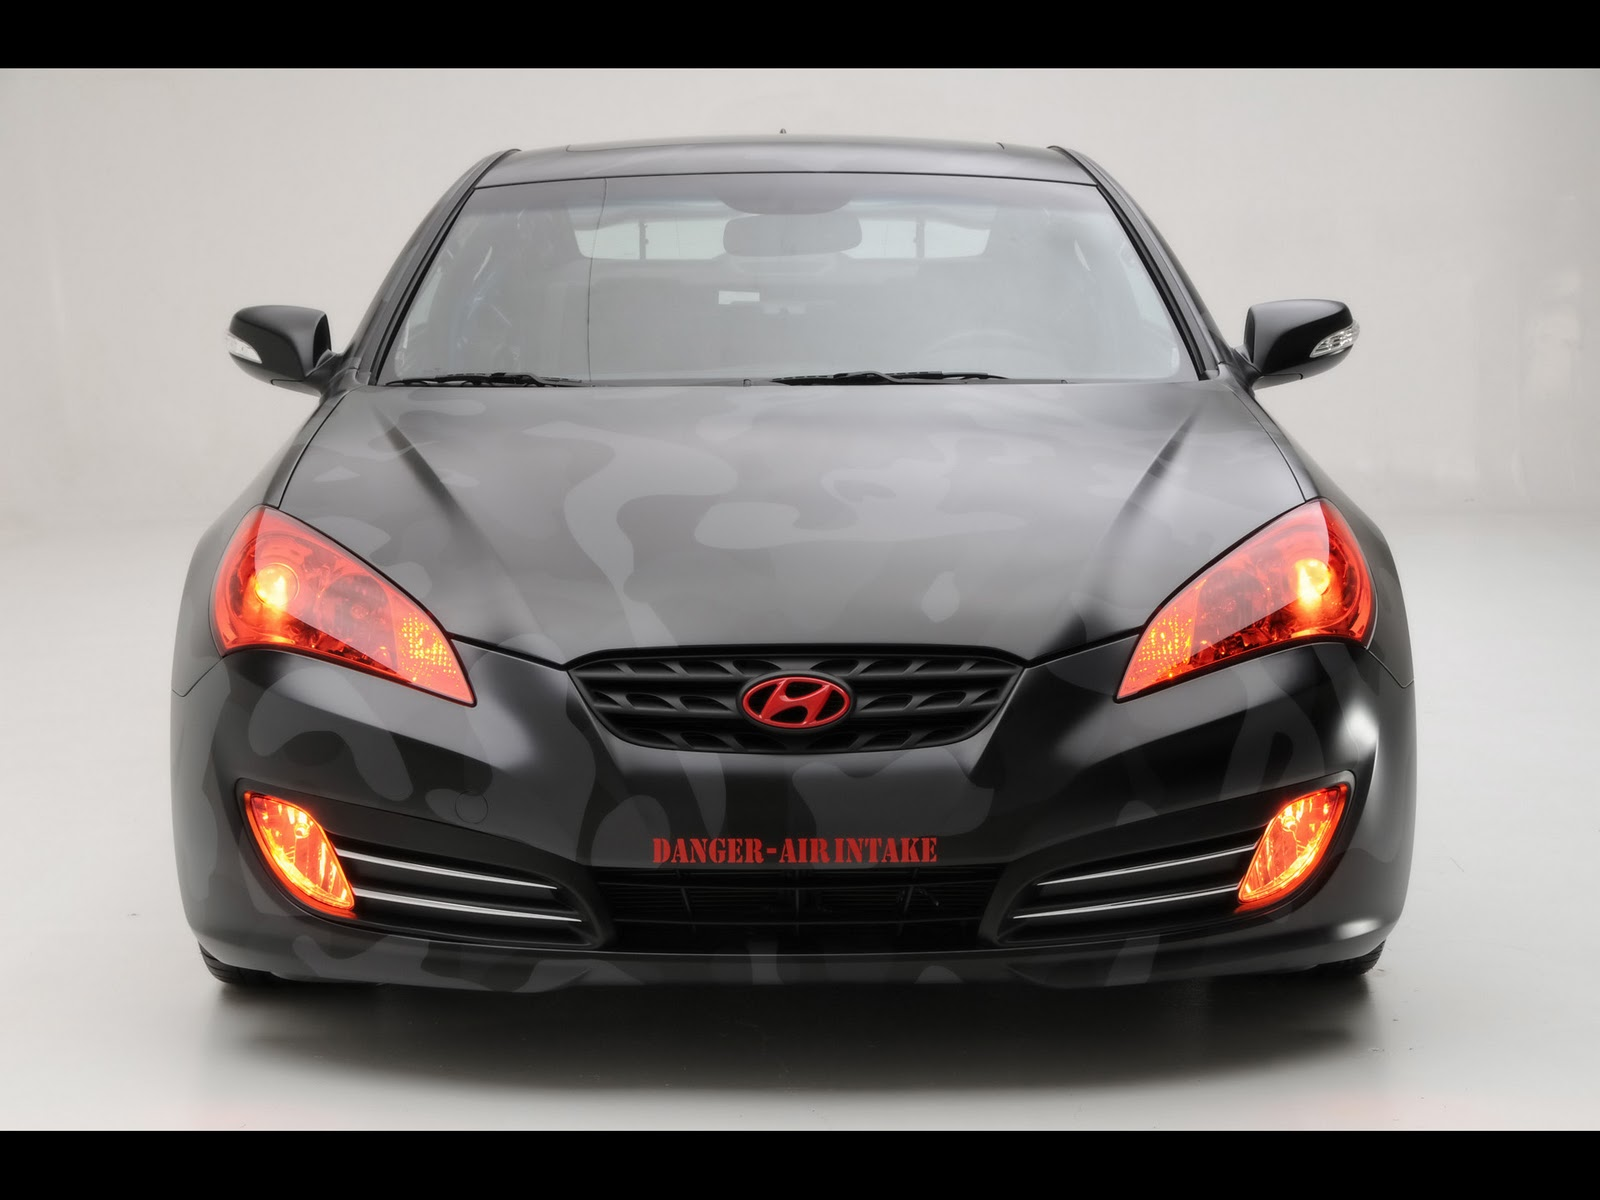 http://2.bp.blogspot.com/_viCh1SFyGrA/TOq8tyHjcHI/AAAAAAAAAHU/k-X13u5ZS9E/s1600/2010-Hyundai-Street-Concepts-Genesis-Coupe-Front-1920x1440.jpg